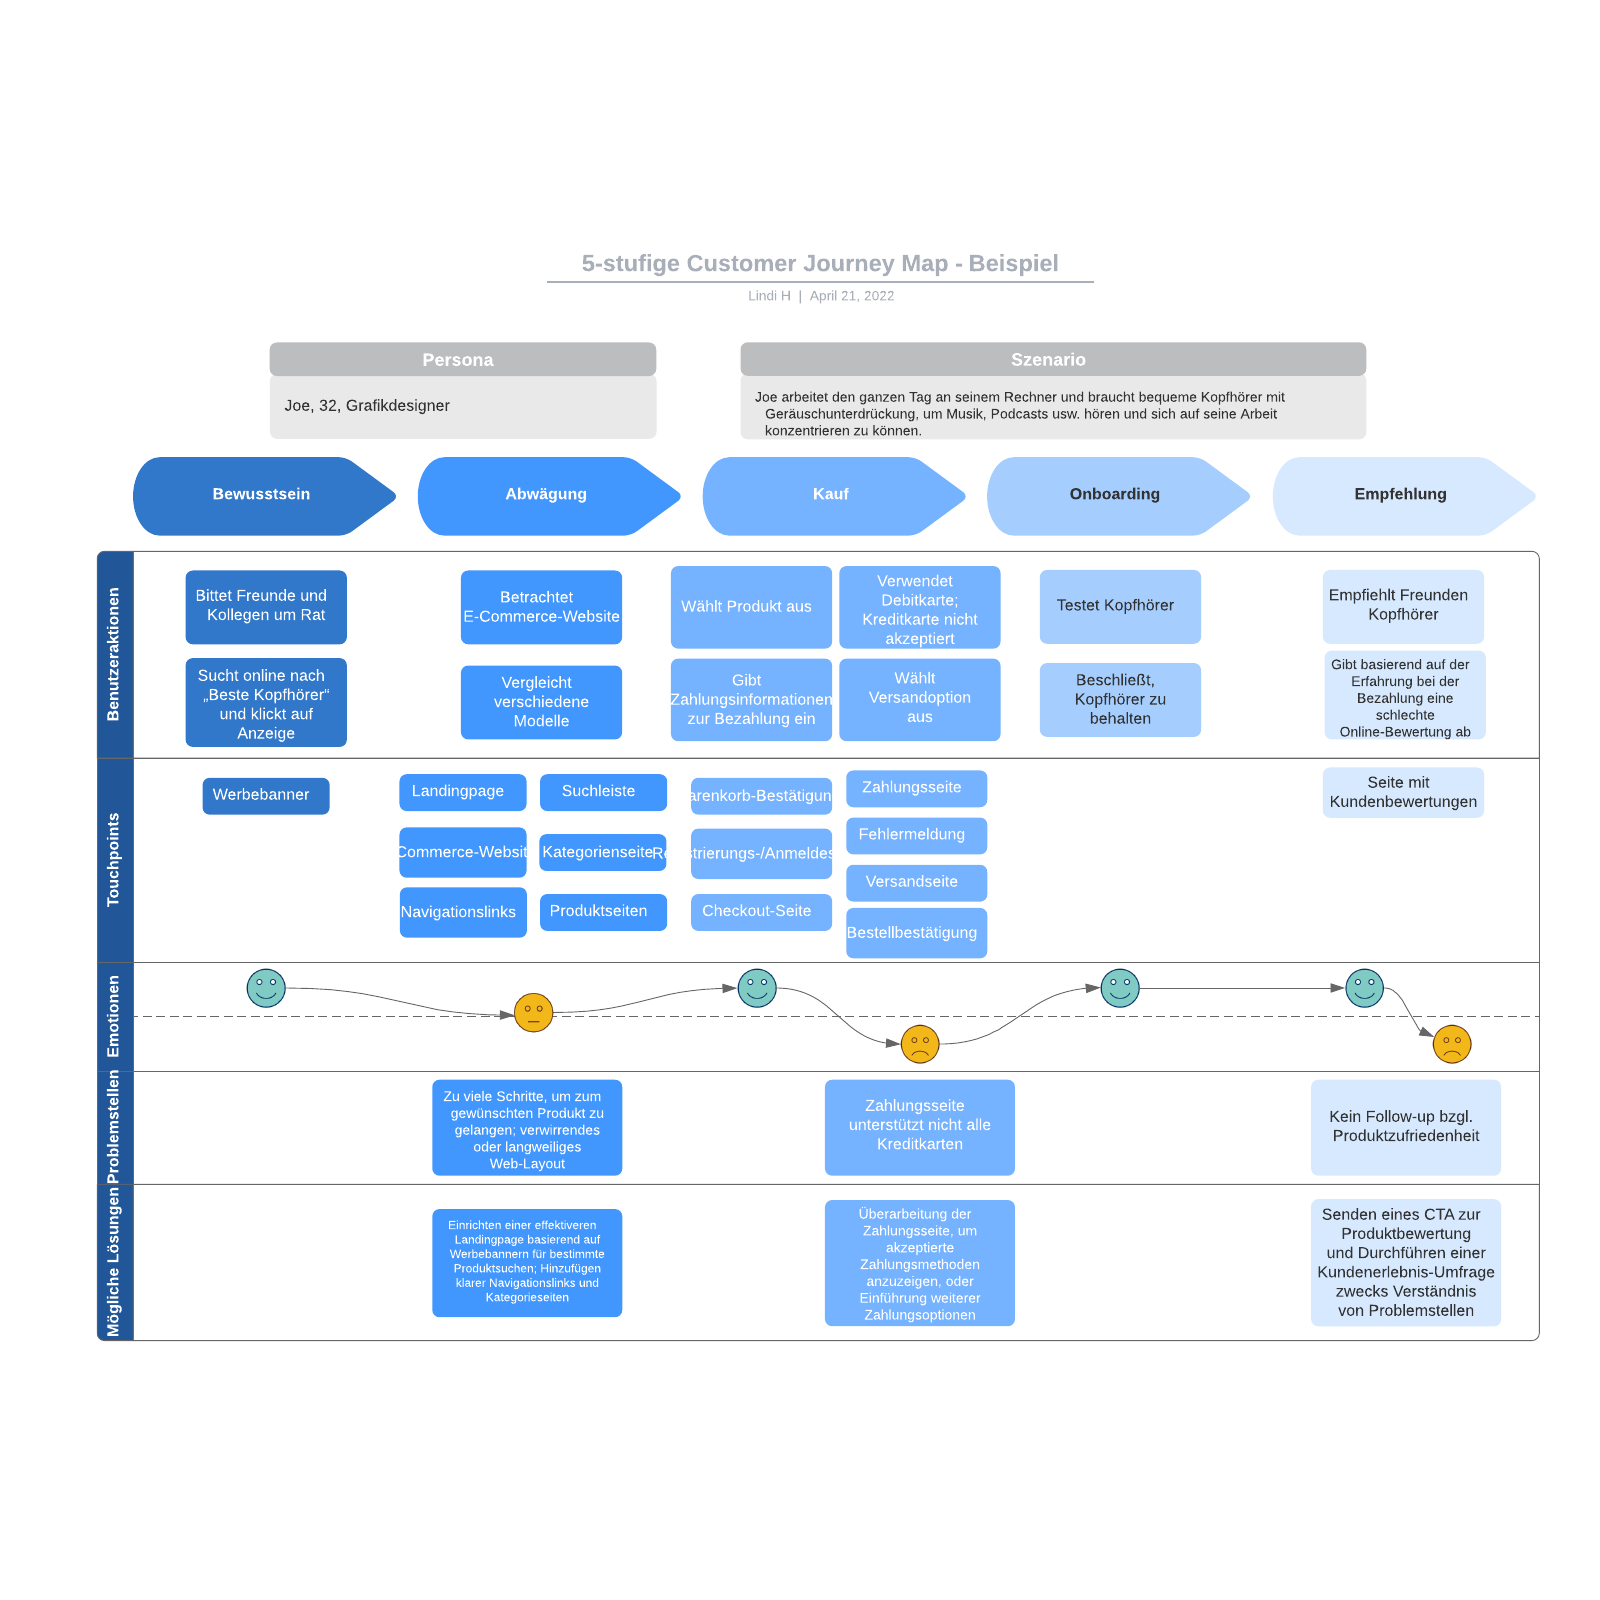 5-stufige Customer Journey Map - Beispiel